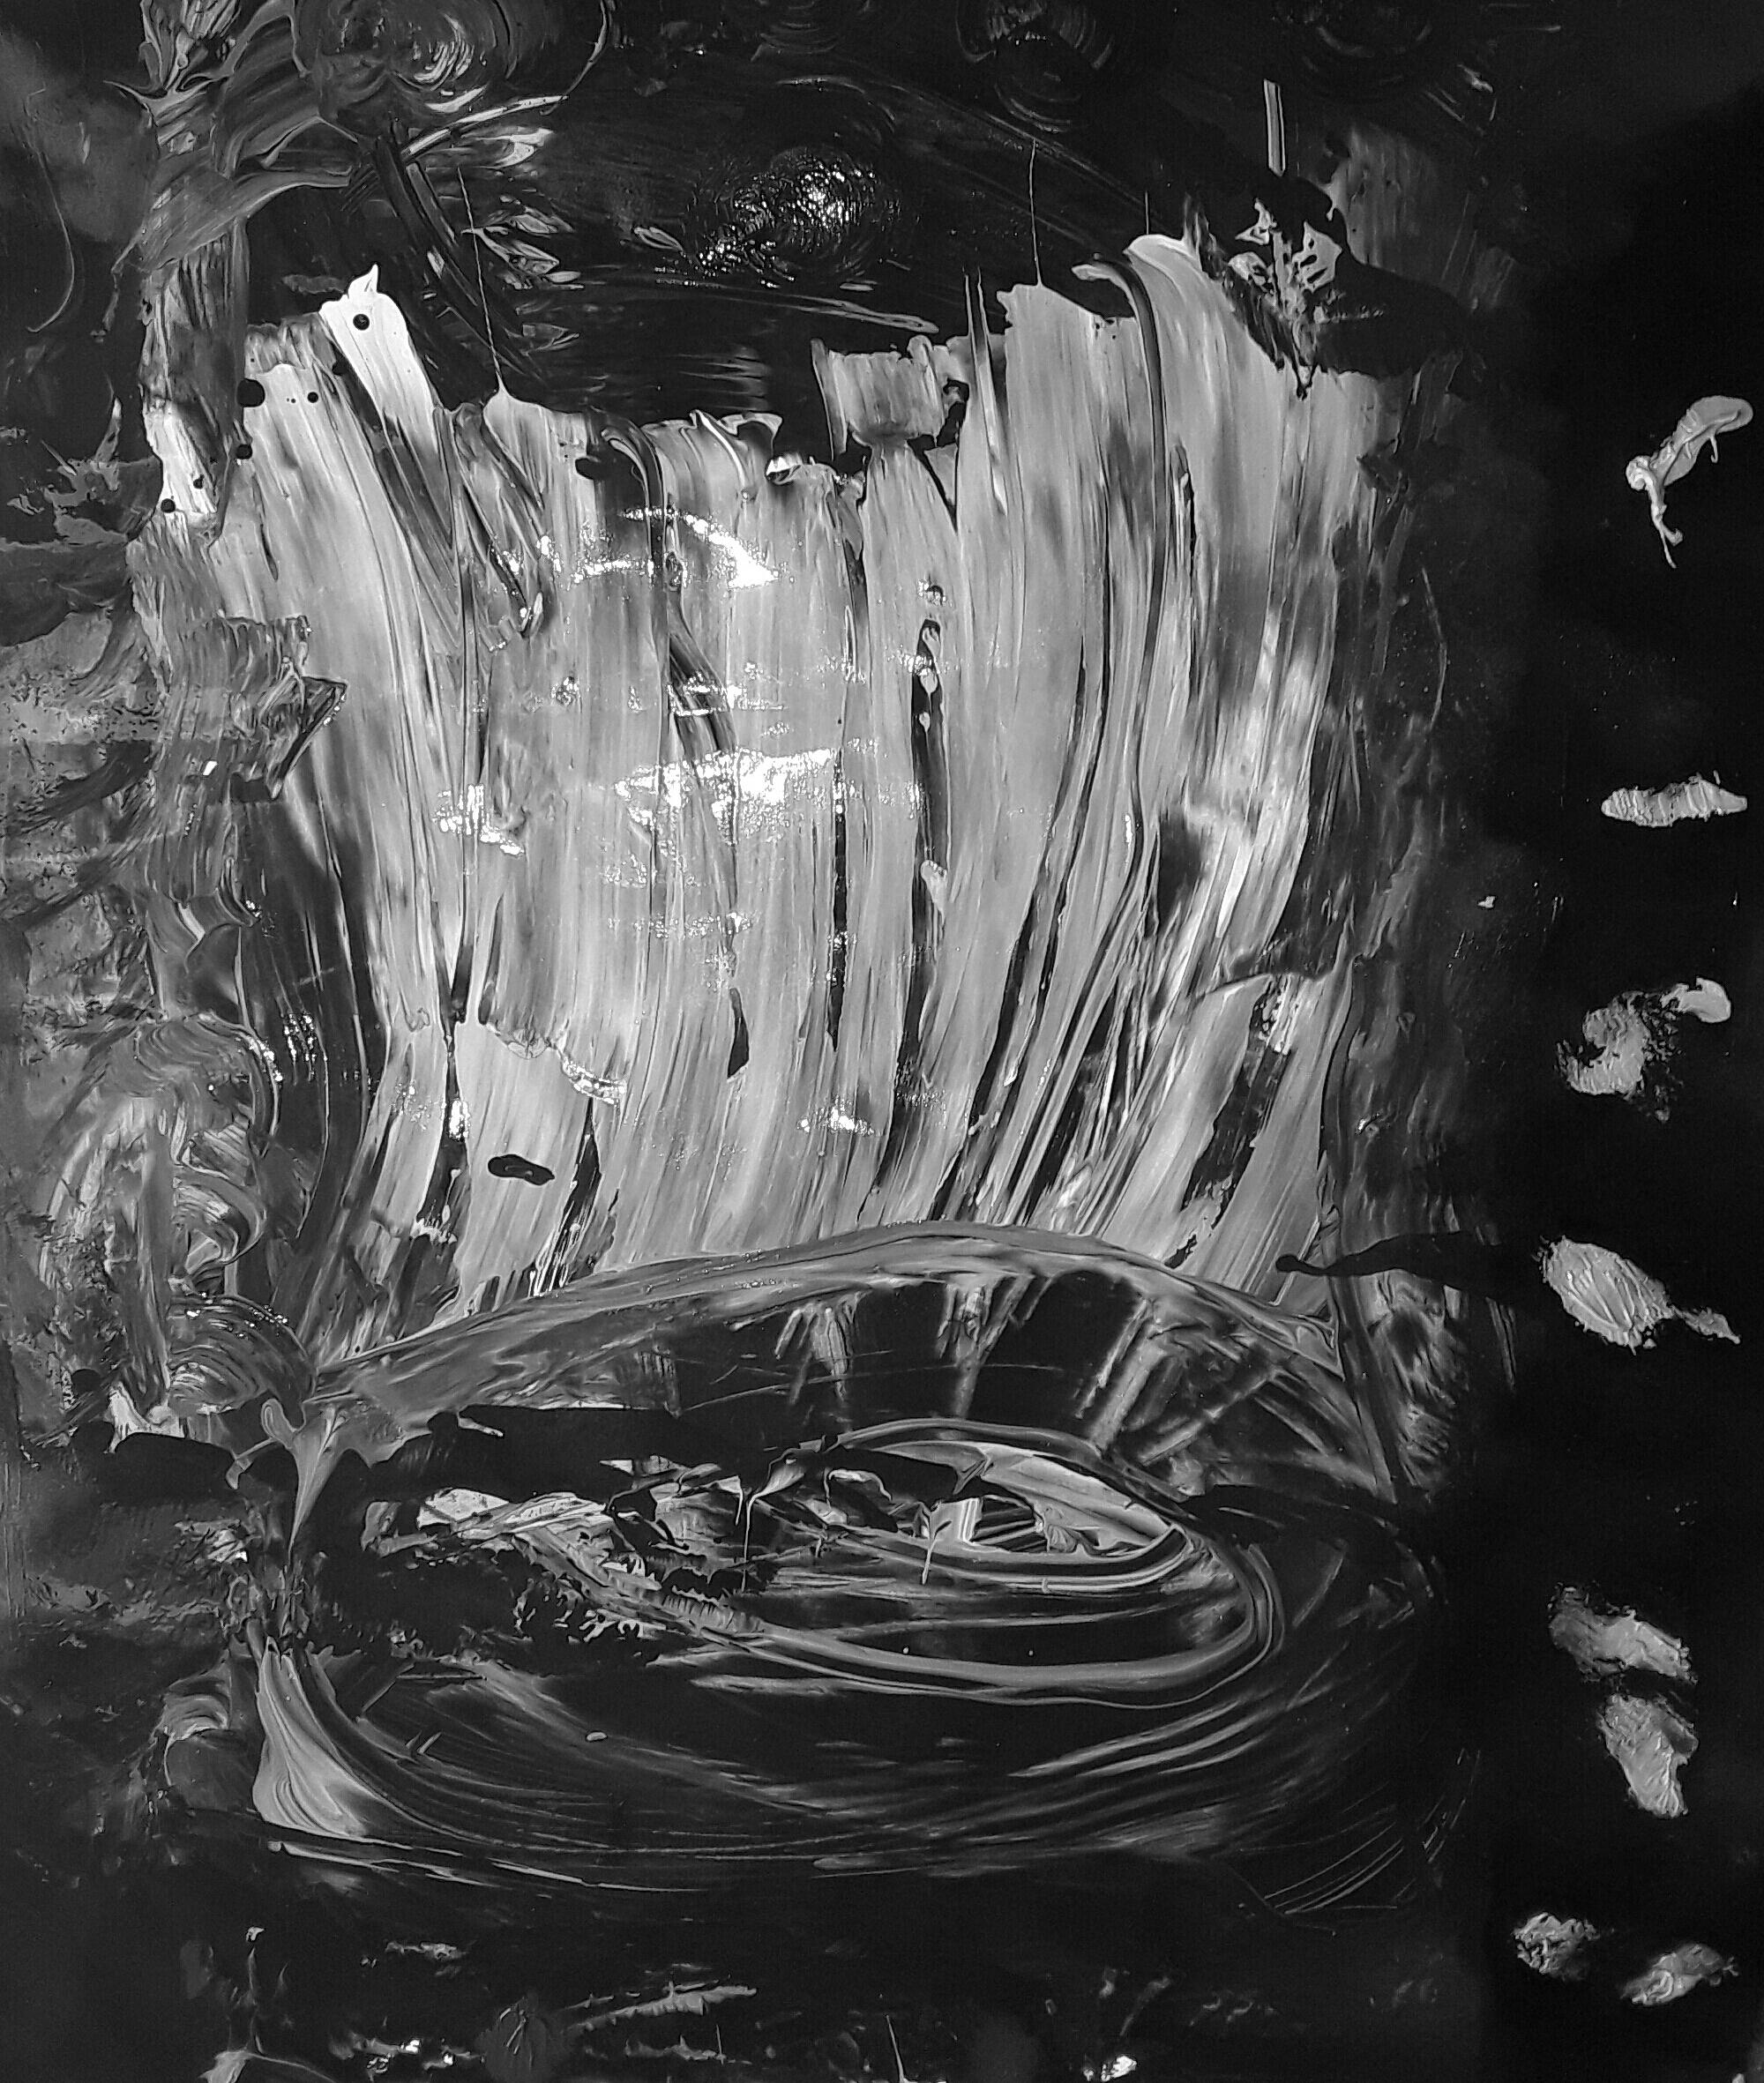 world - painting, art - martinbickel | ello